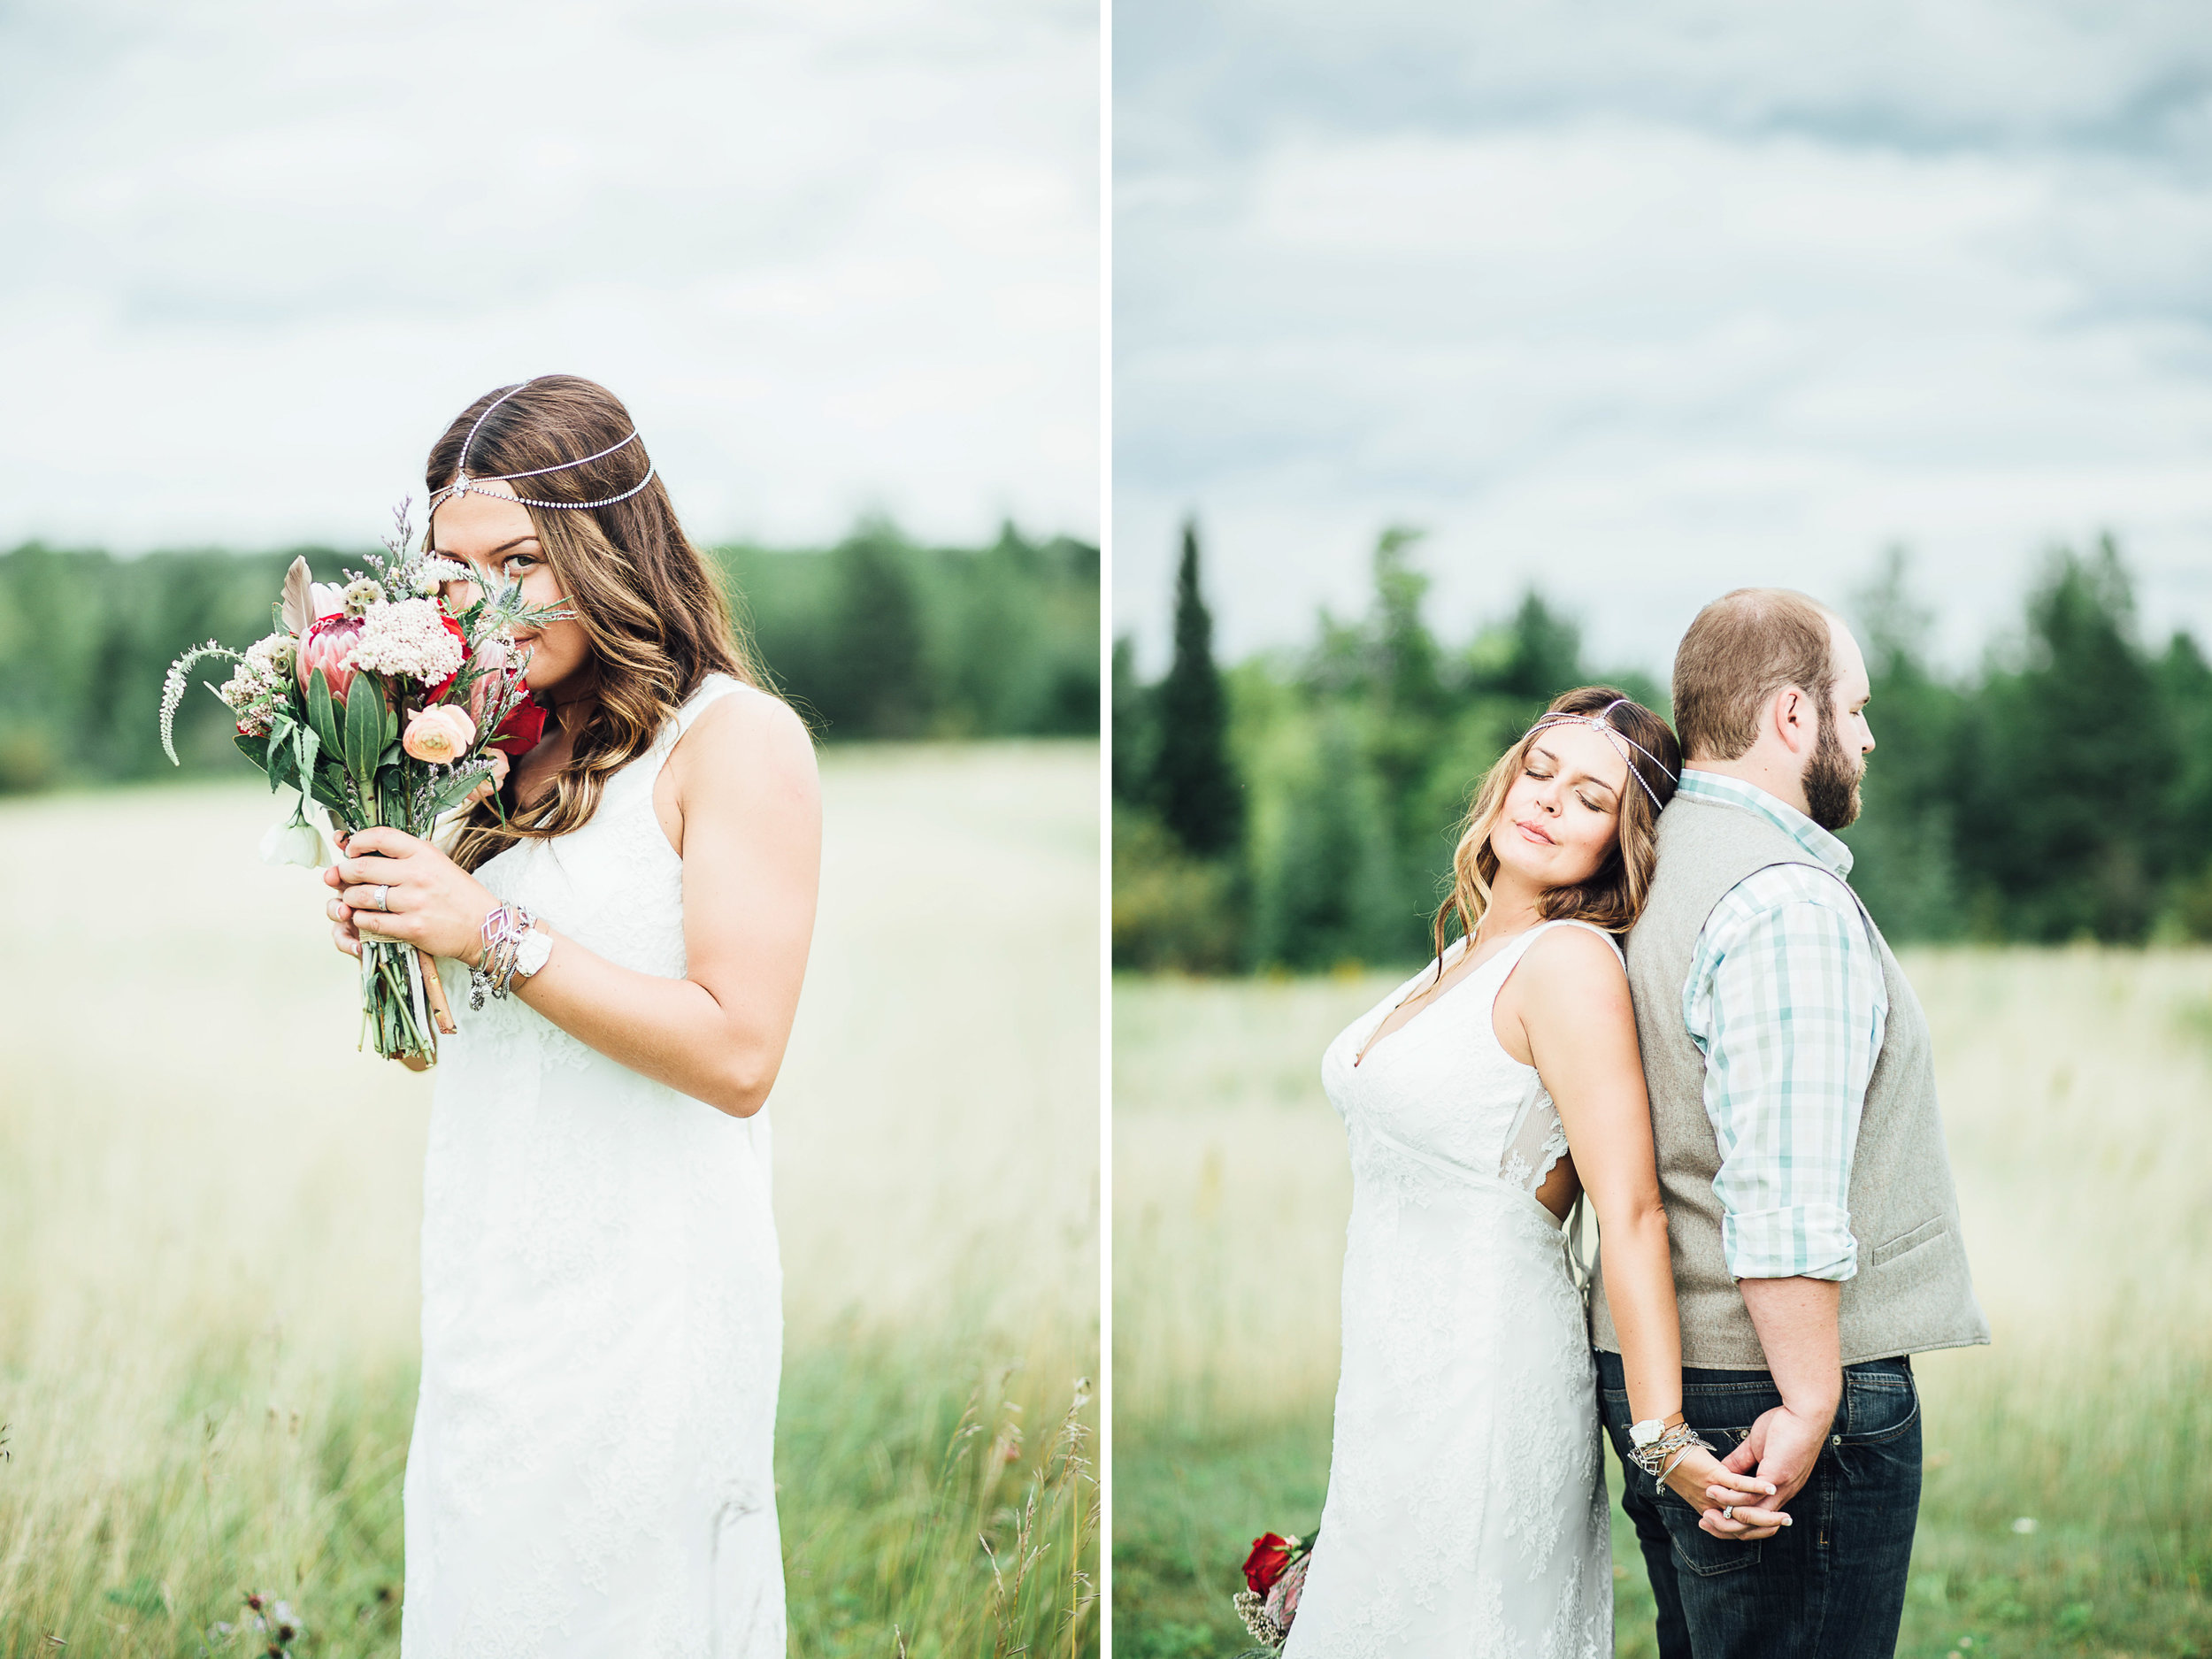 Bohemian Wedding - Sabrina Leigh Studios - Northern Michigan Wedding Photographer074.jpg